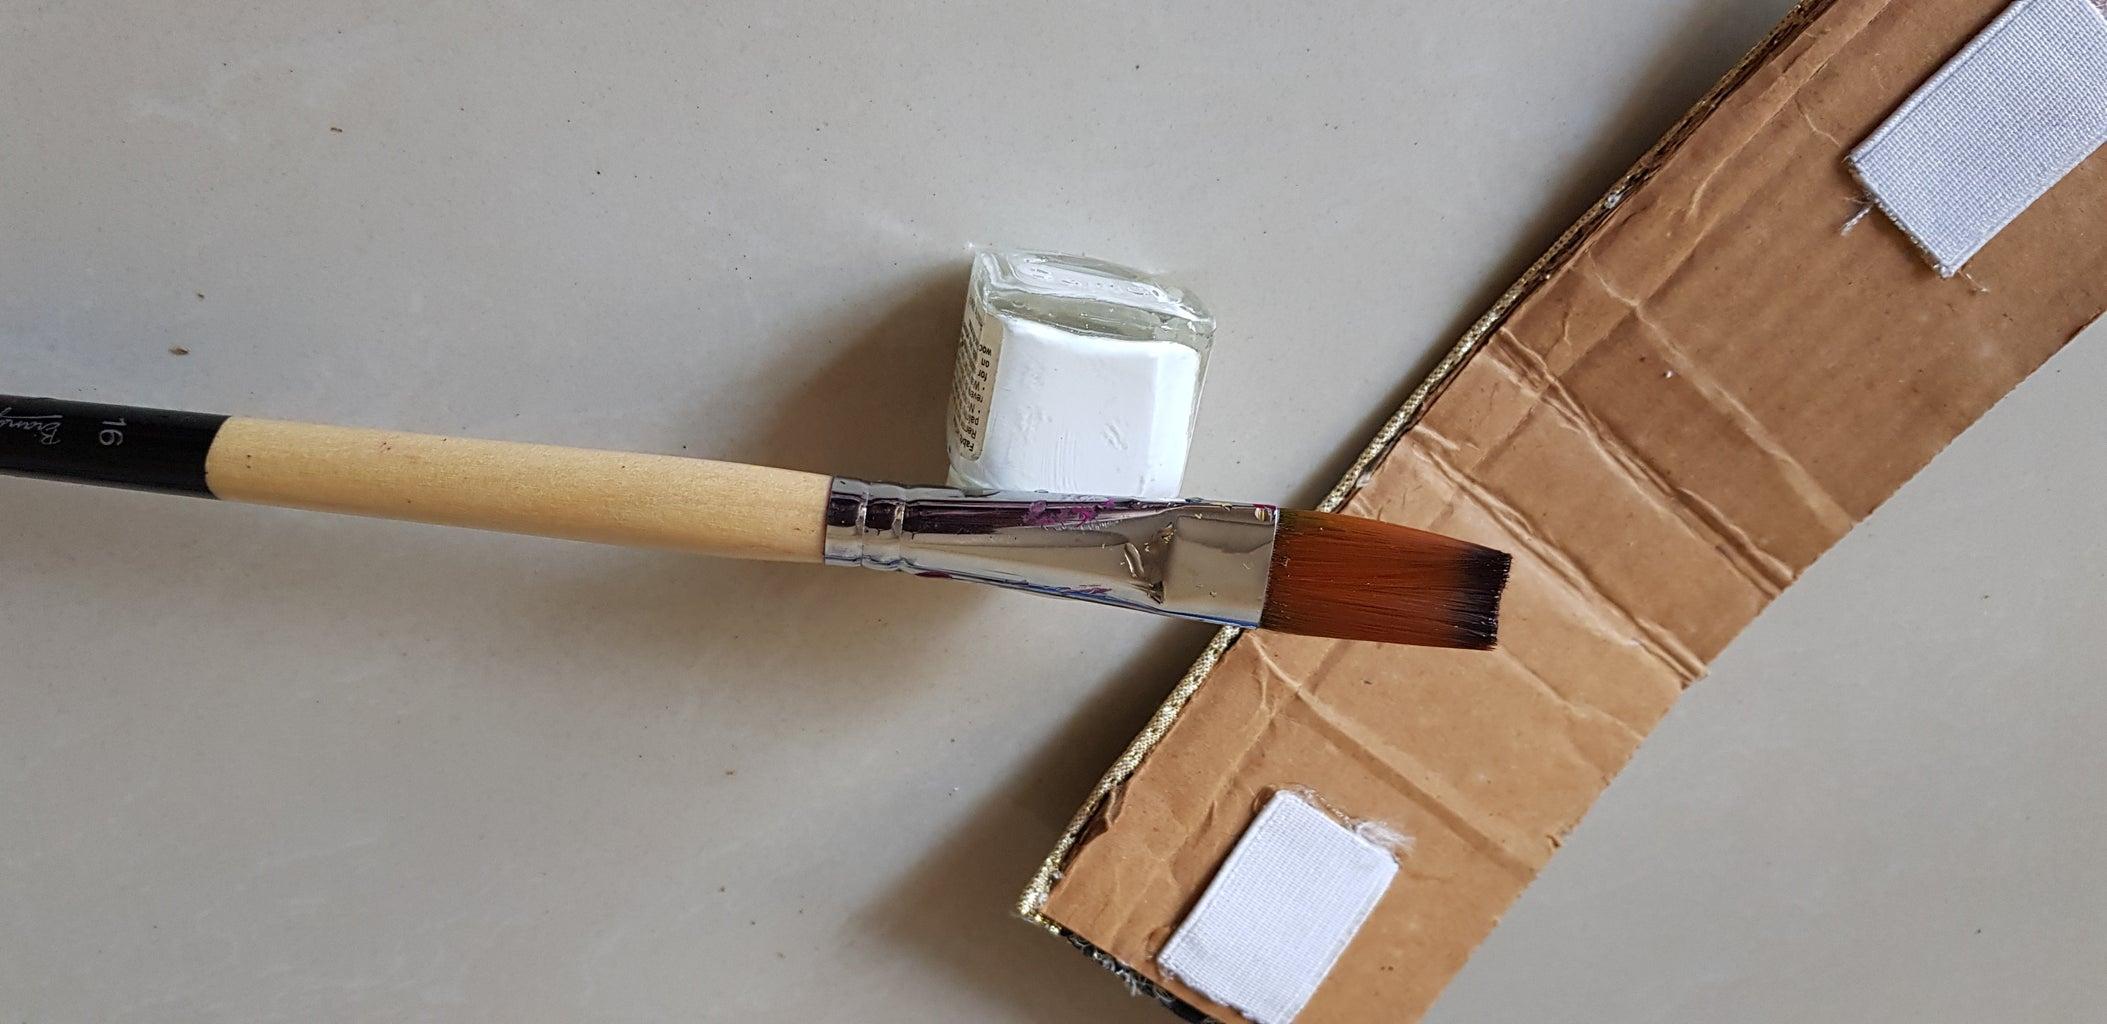 Making Pencil Holder